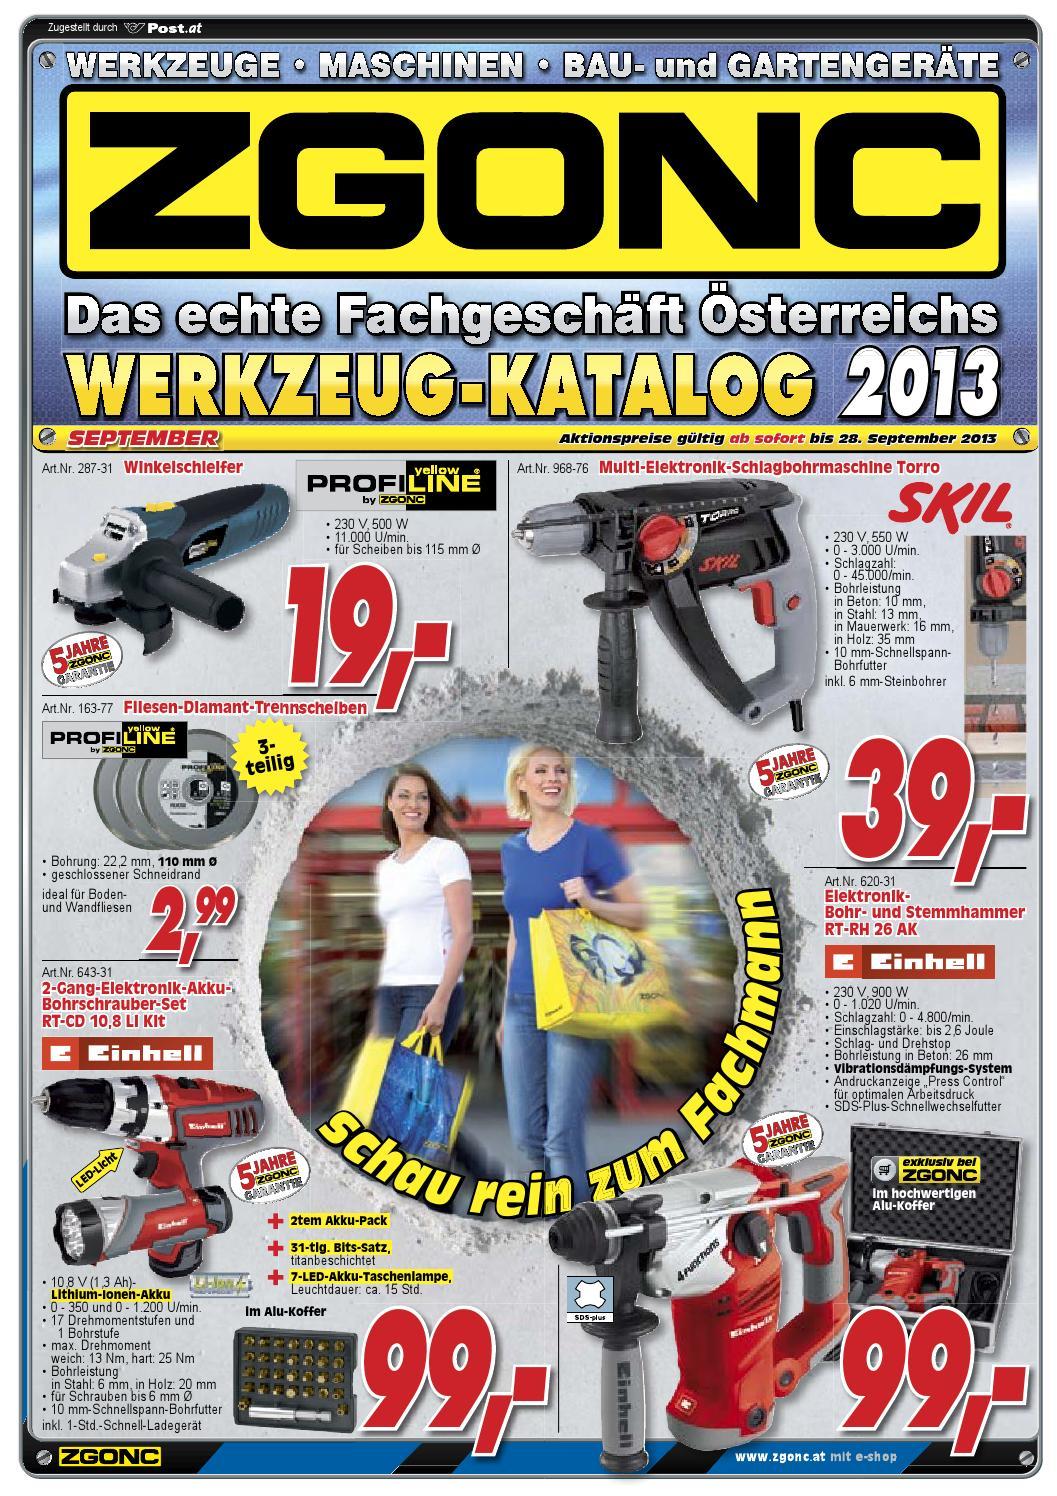 HCS Profi Schlangenbohrer Holzbohrer Holzspiralbohrer 10-25mm Werkzeug Dauerhaft